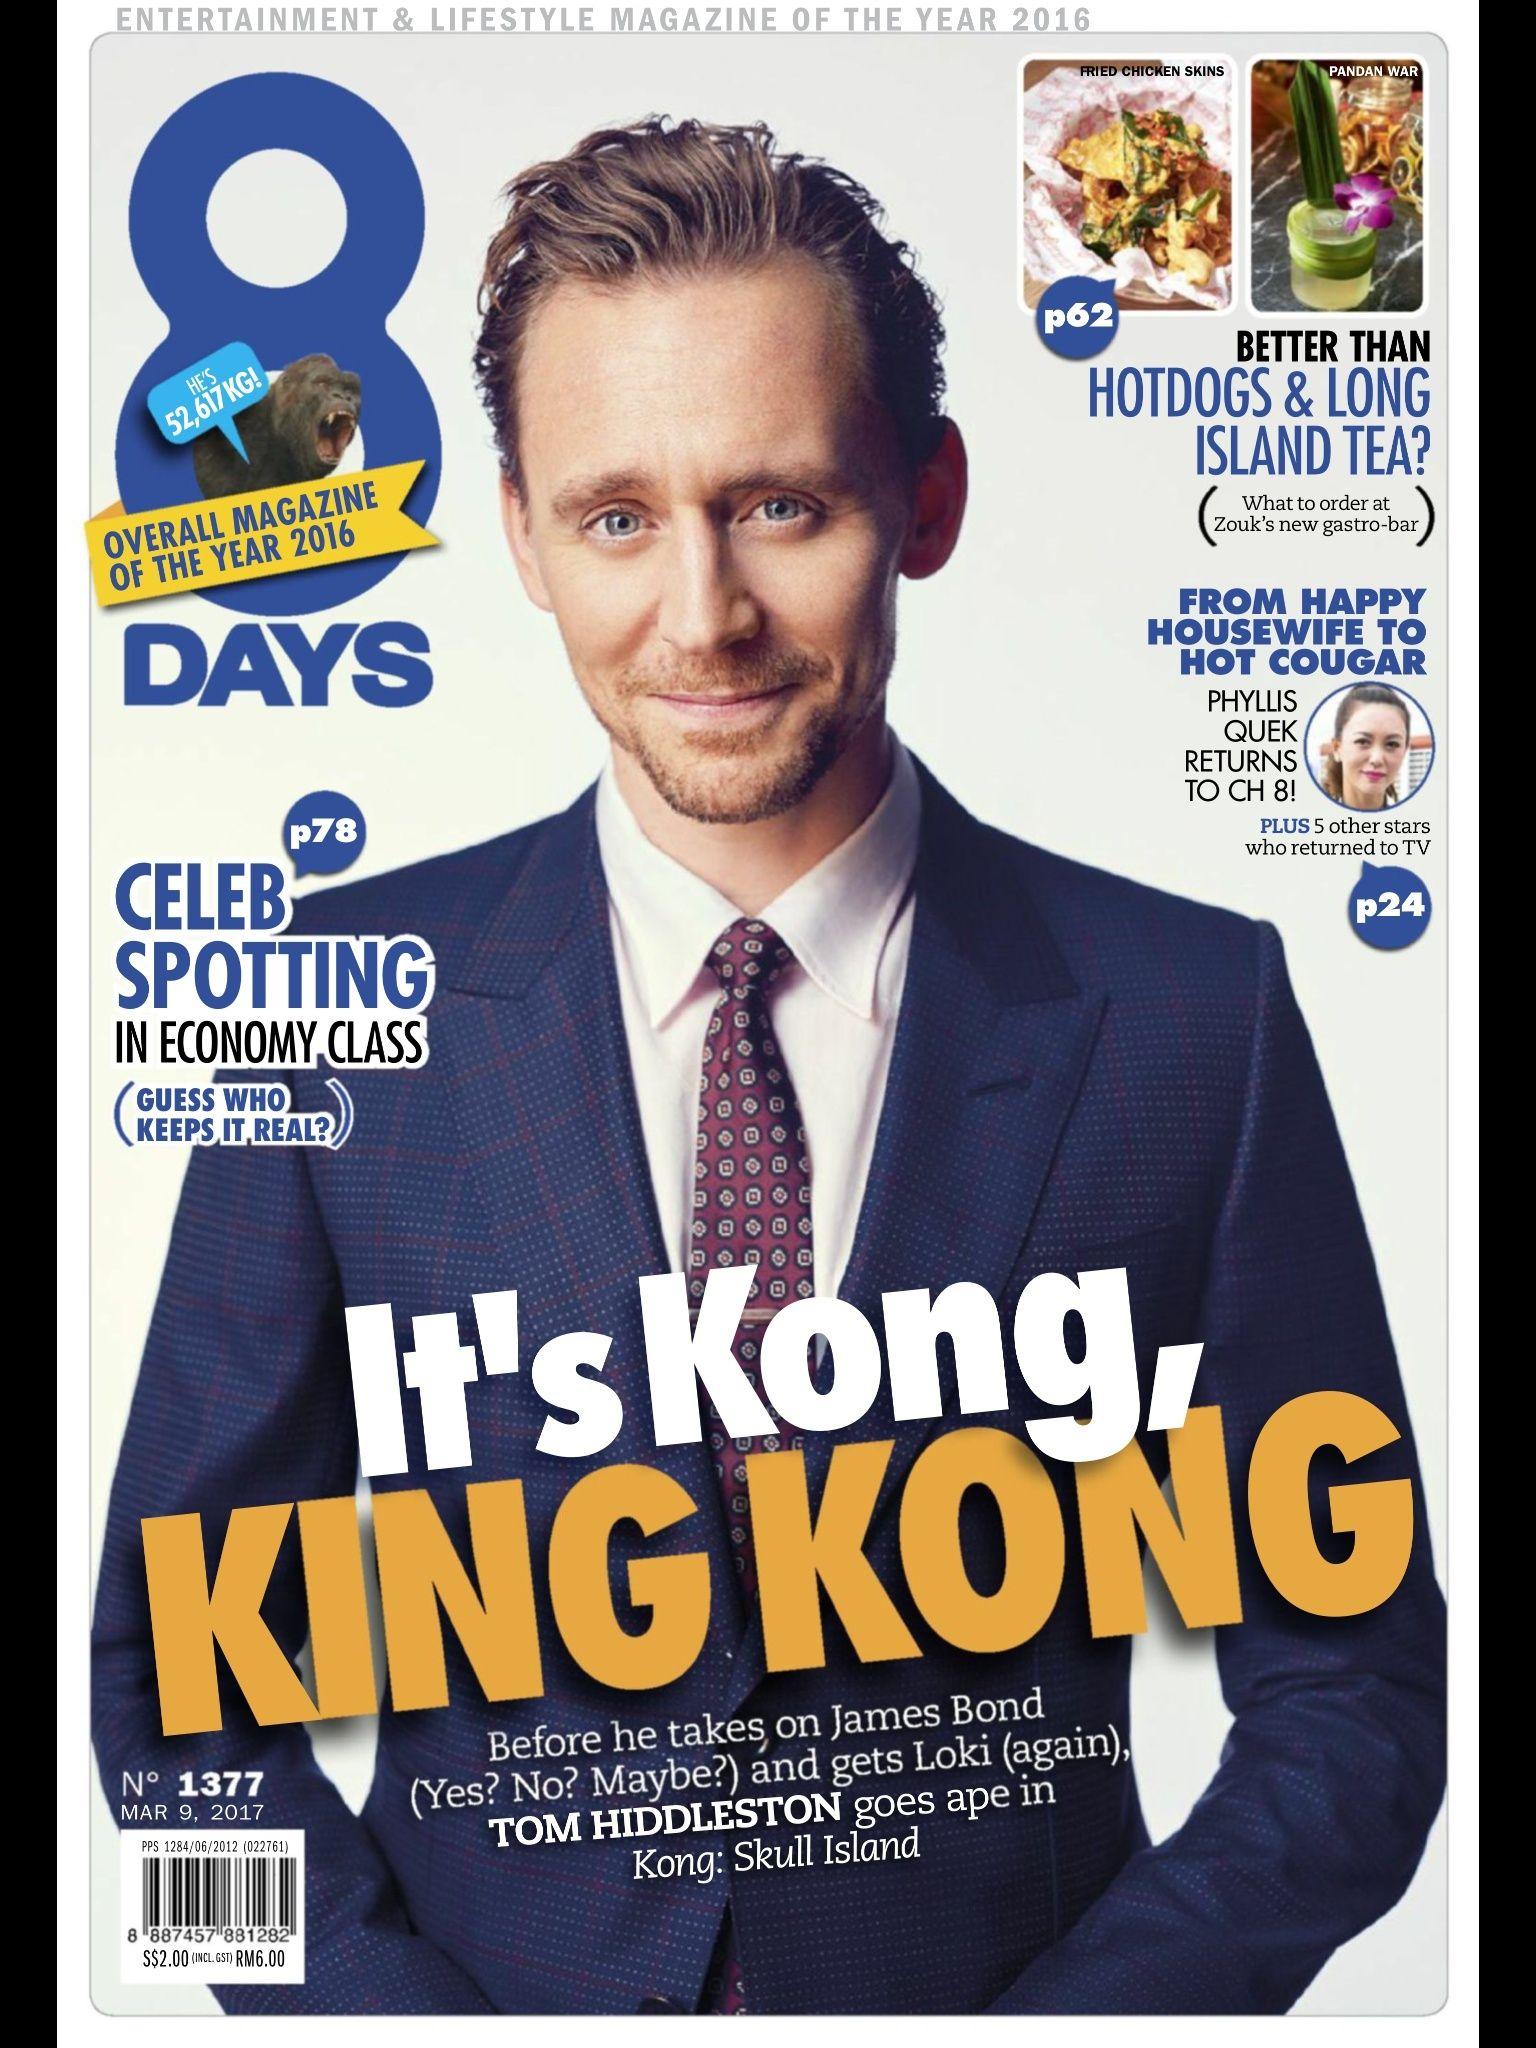 8 Days Magazine - March 9, 2017. Scans magazine here: http://imgbox.com/g/BSmGo5UloM